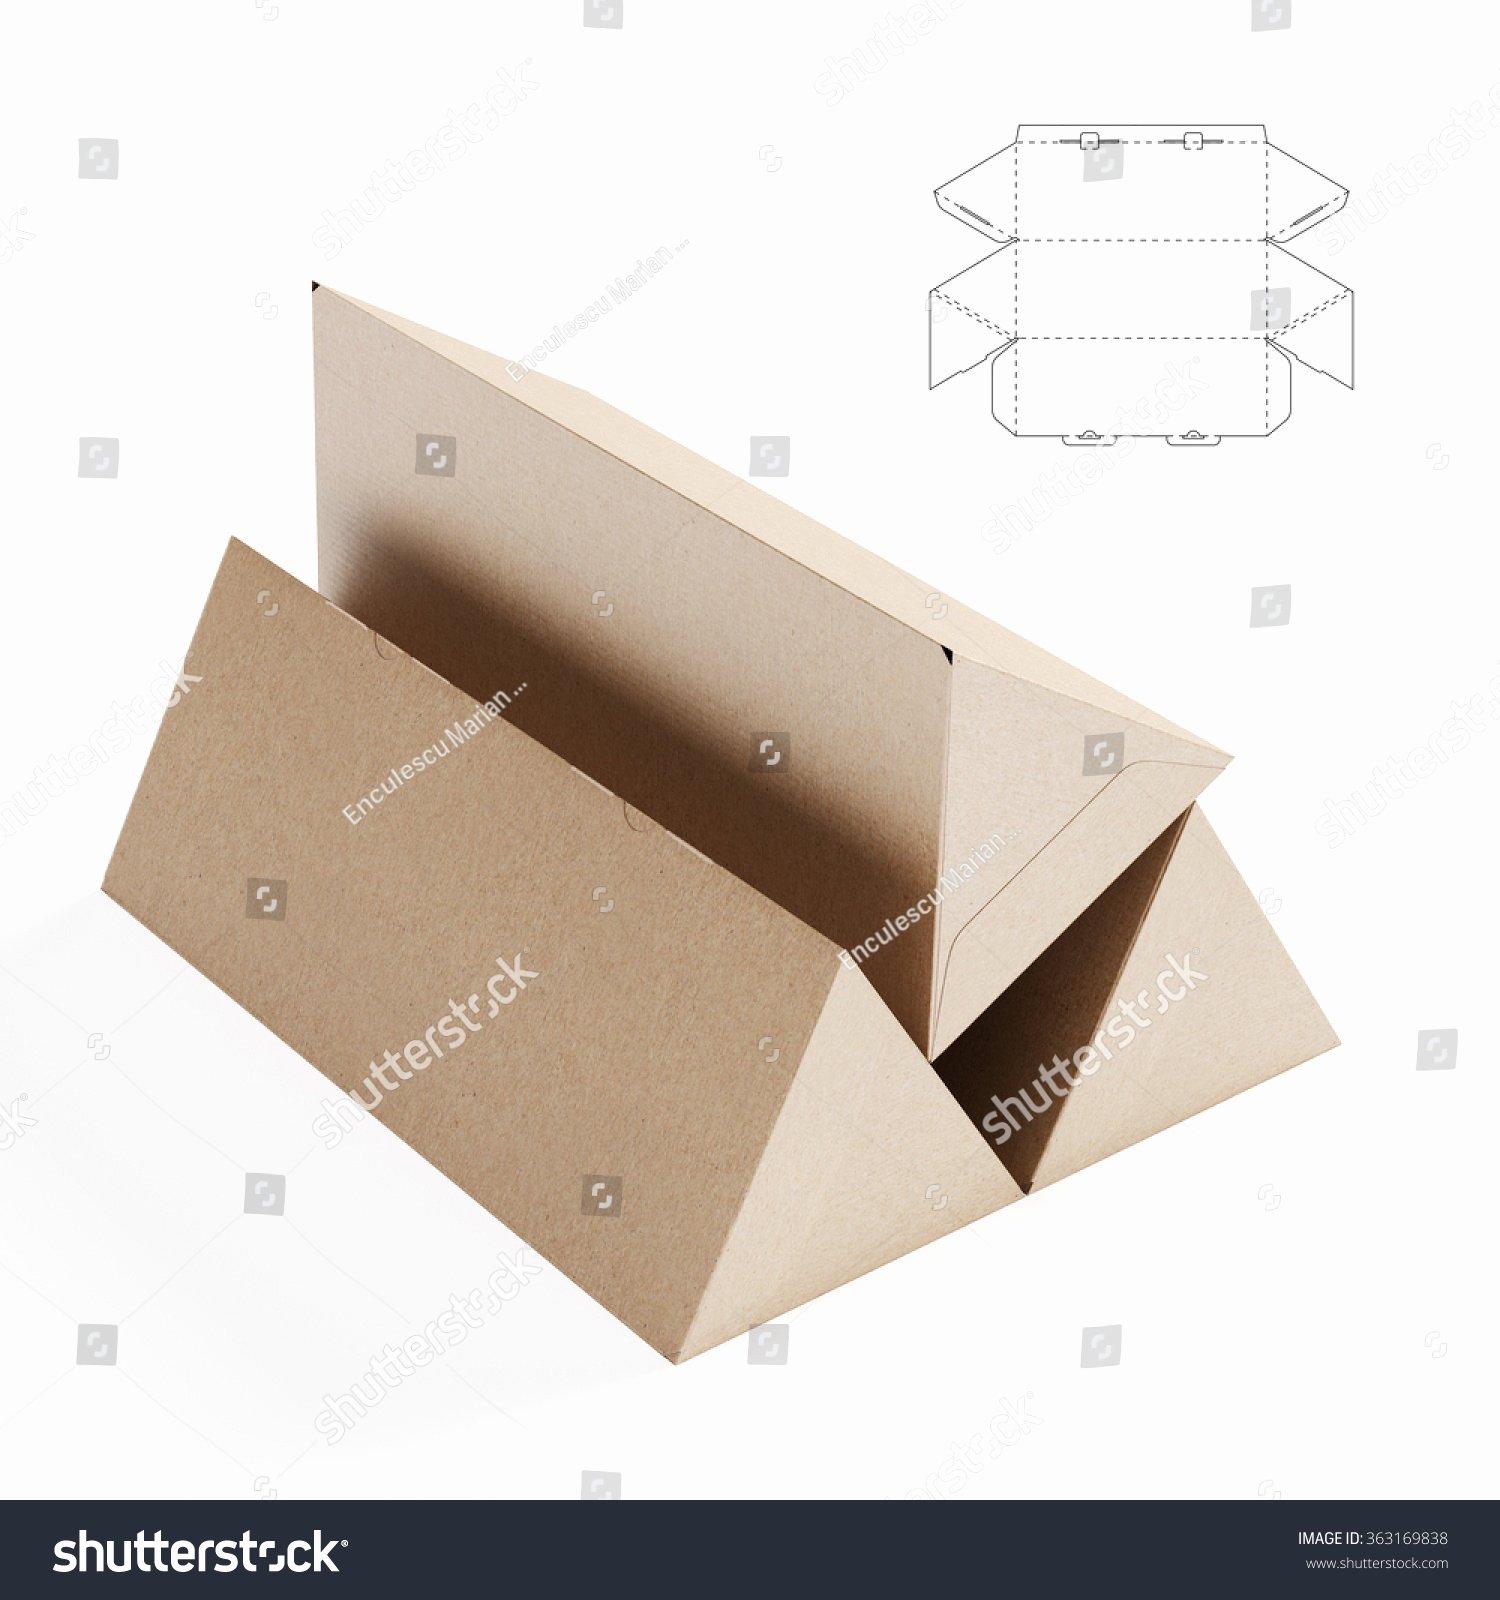 Die Cut Box Template New Triangular Box Die Cut Template Stock Illustration